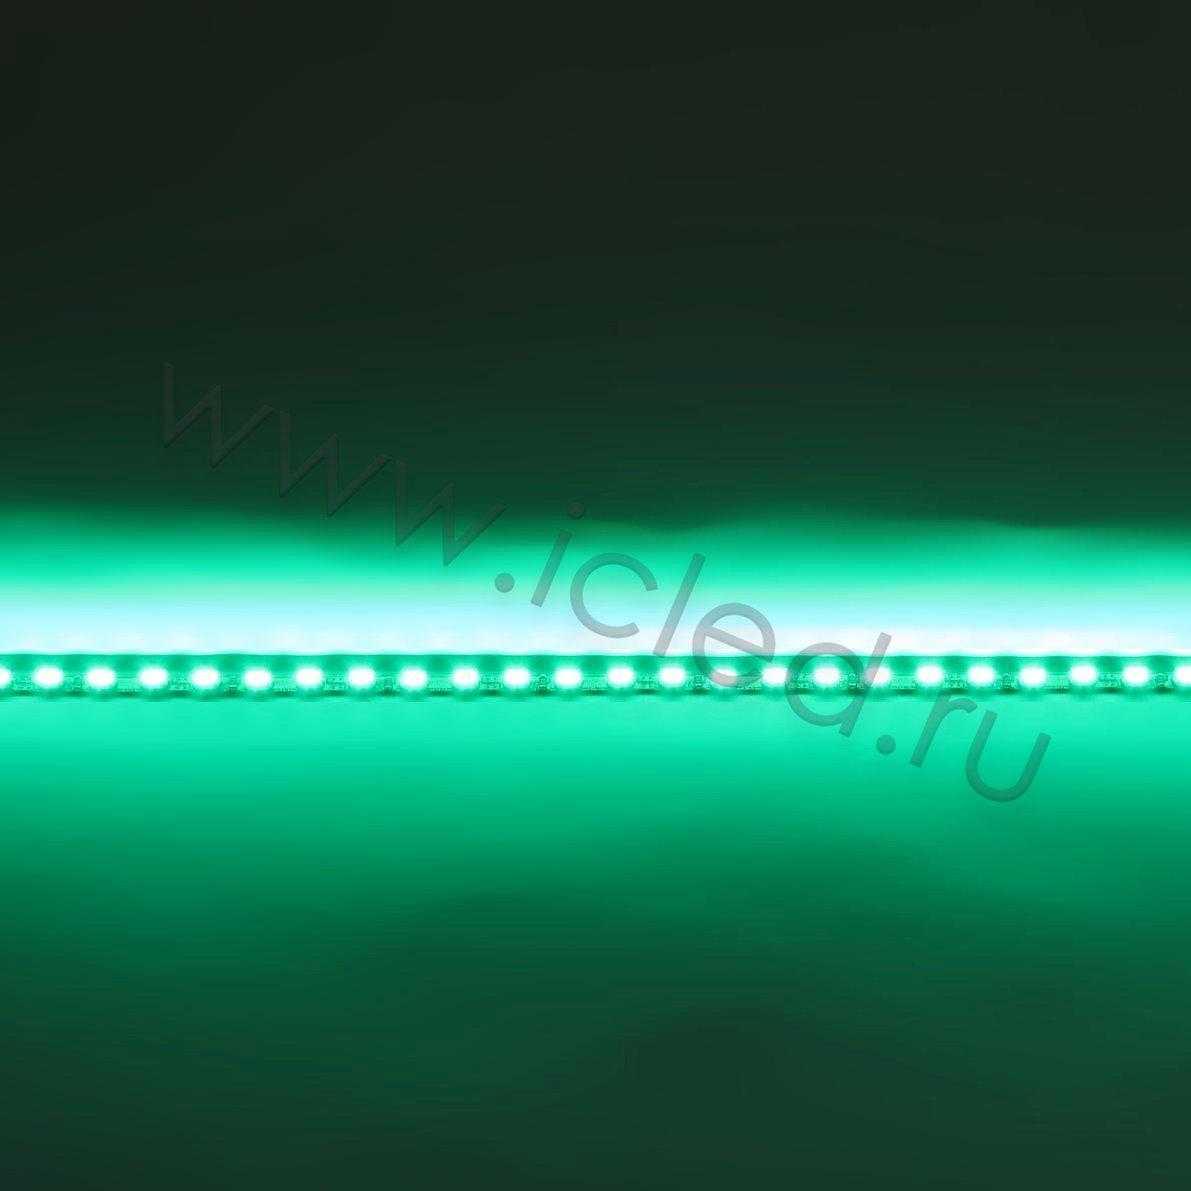 Светодиодная линейка для LCD, 3020, 48led, Green, 12V, IP33